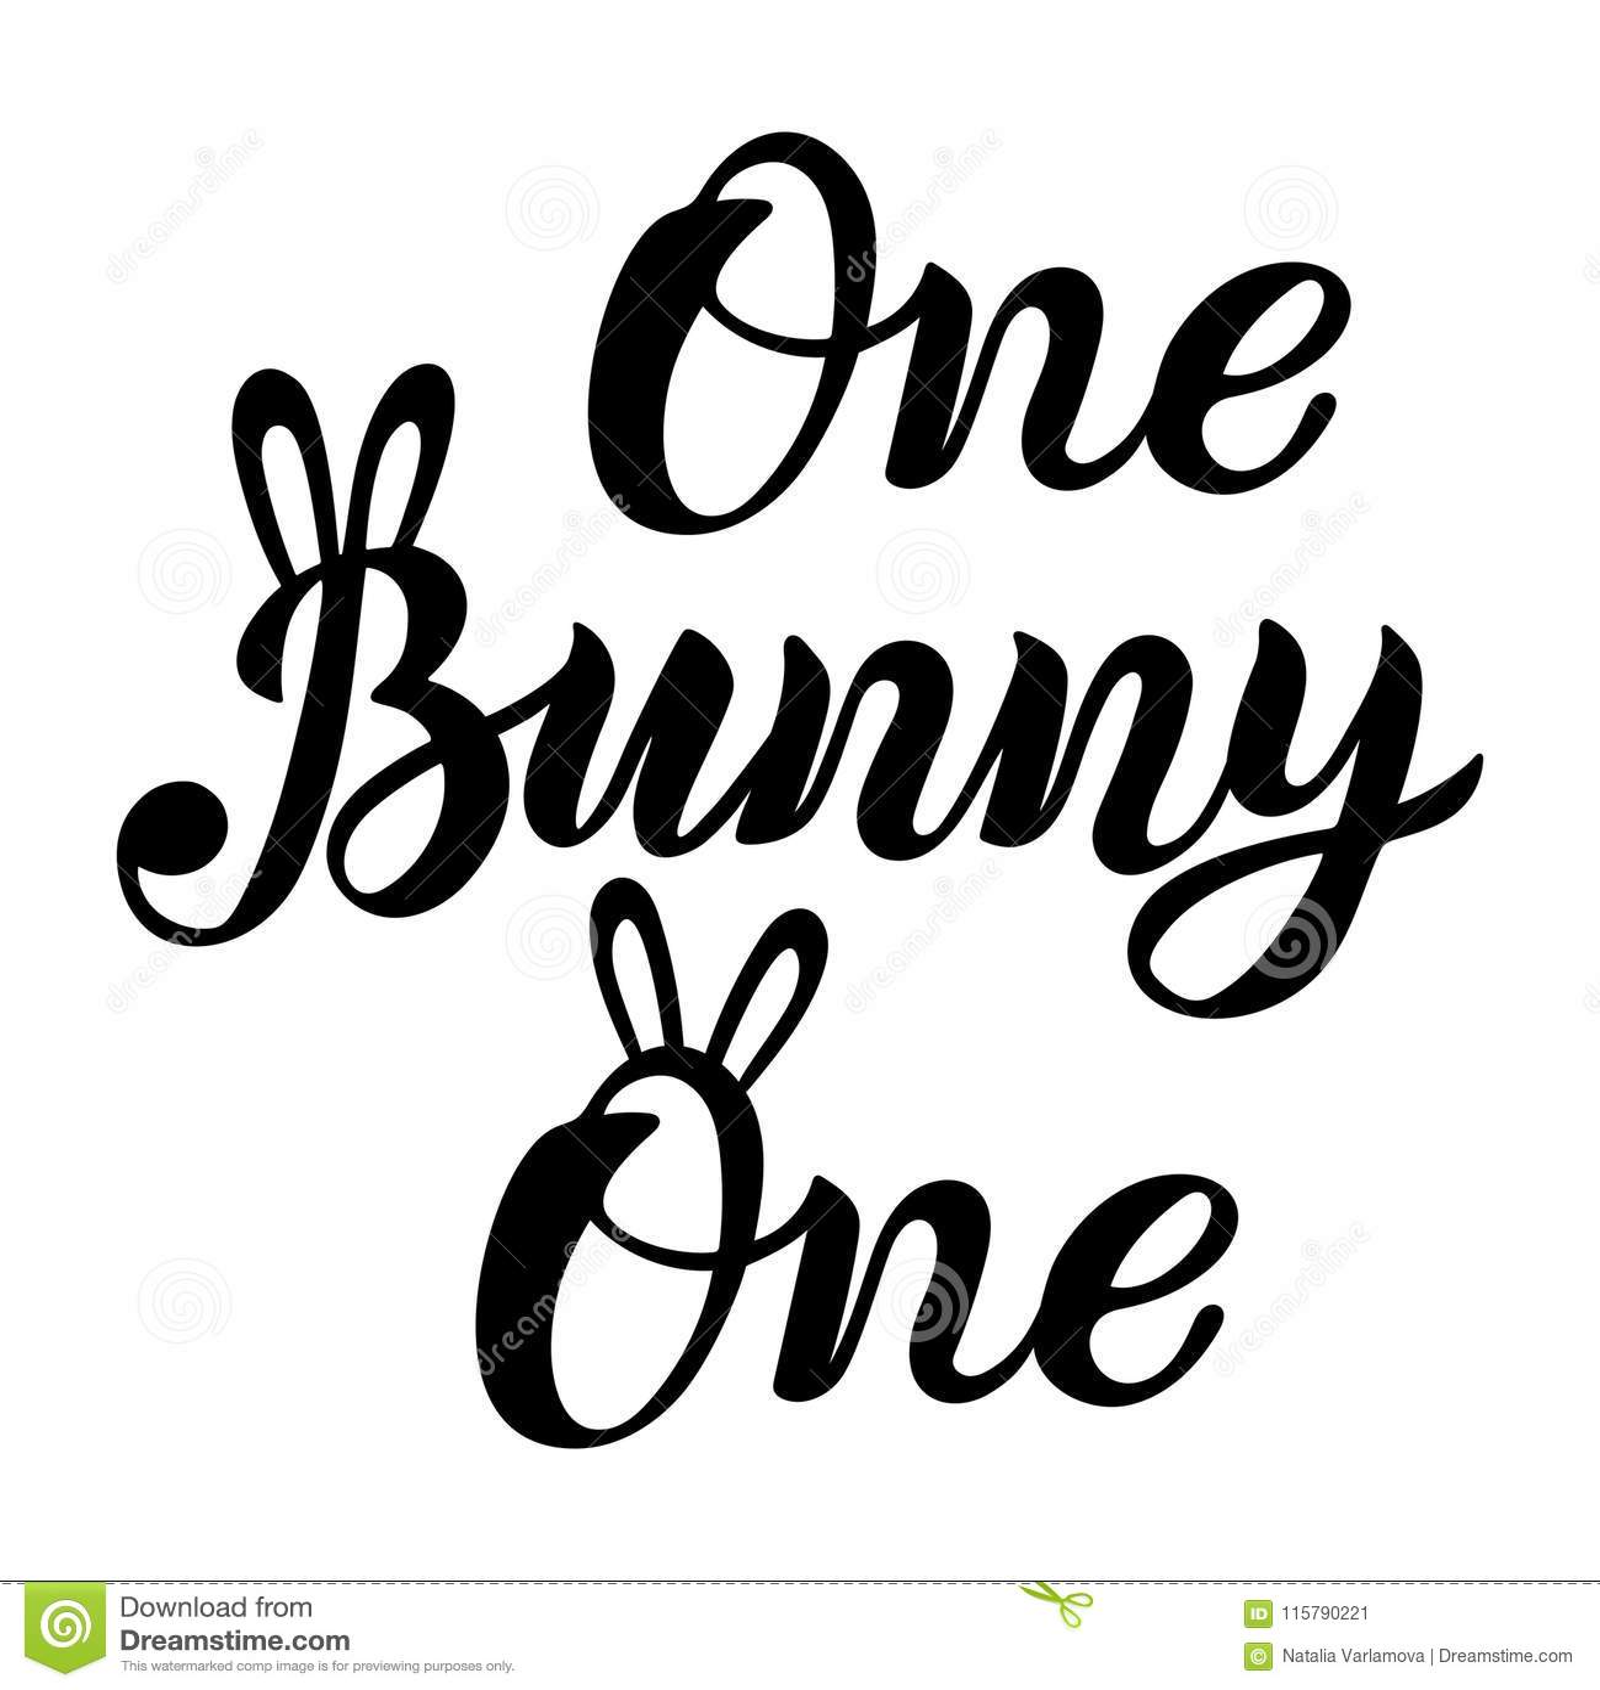 Bunny, One Handwritten Lettering Stock Vector - Illustration